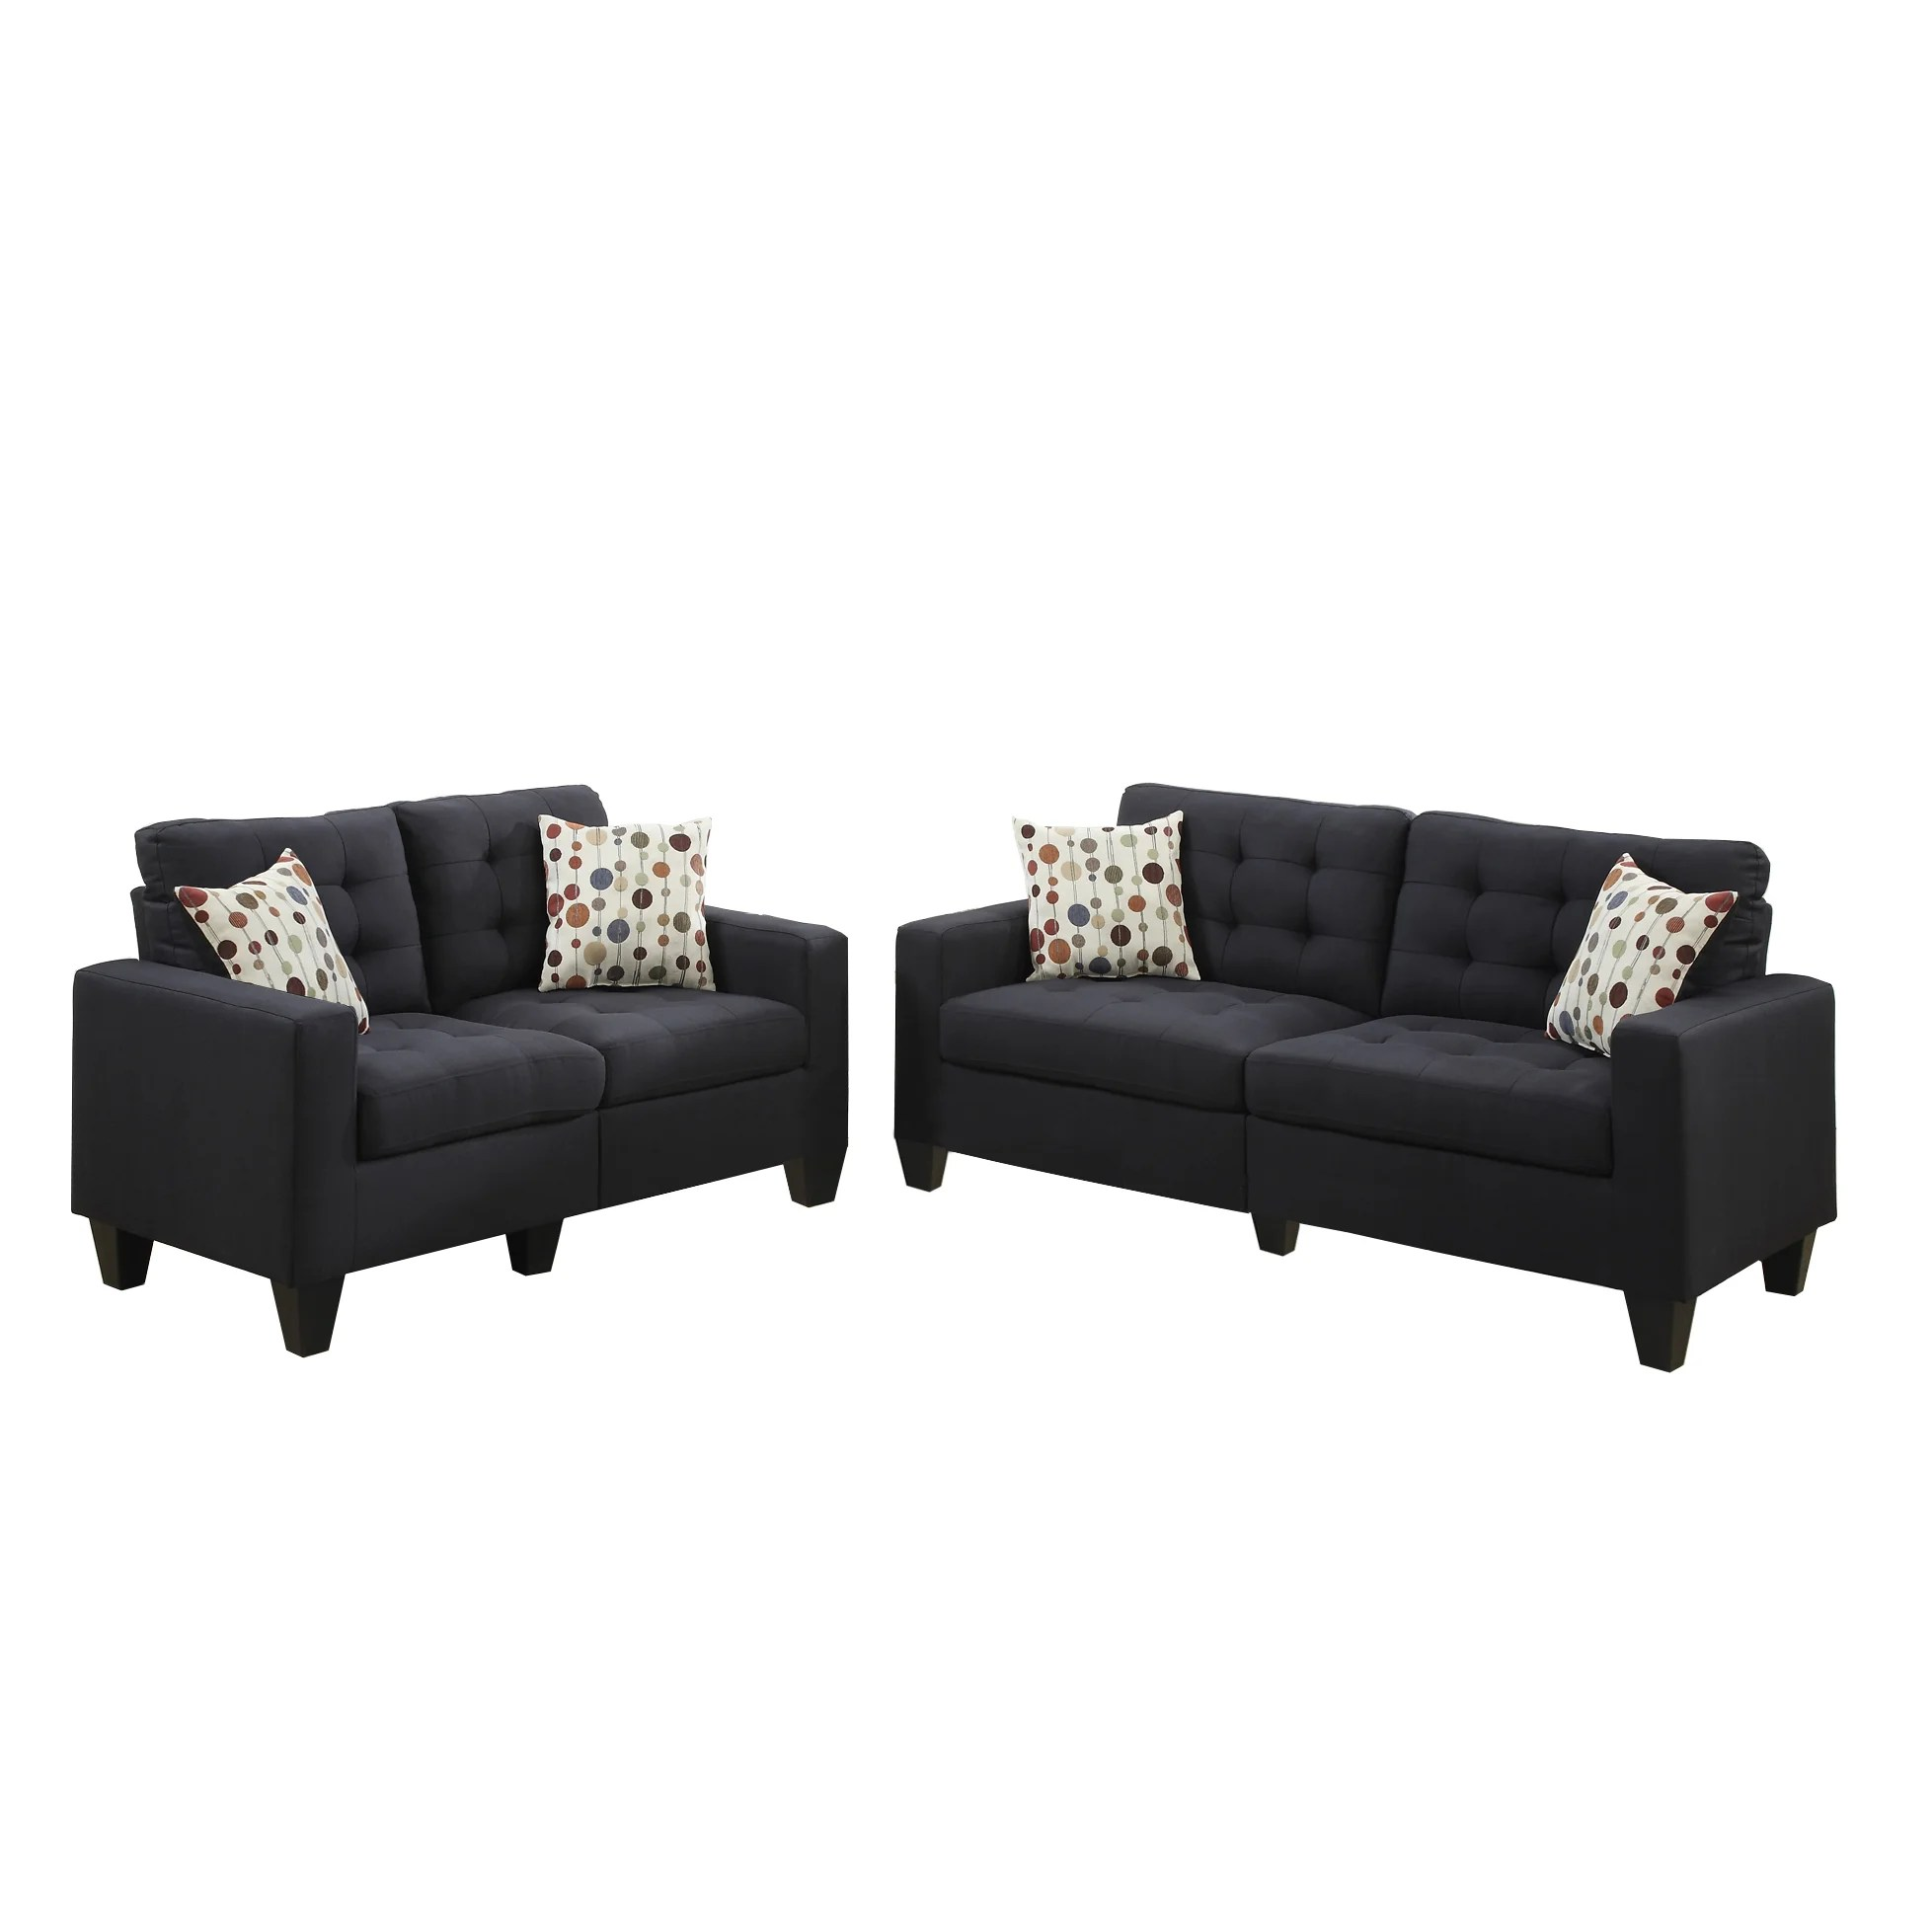 bobkona sectional sofa embly instructions short height sofas poundex windsor 2 piece and loveseat set